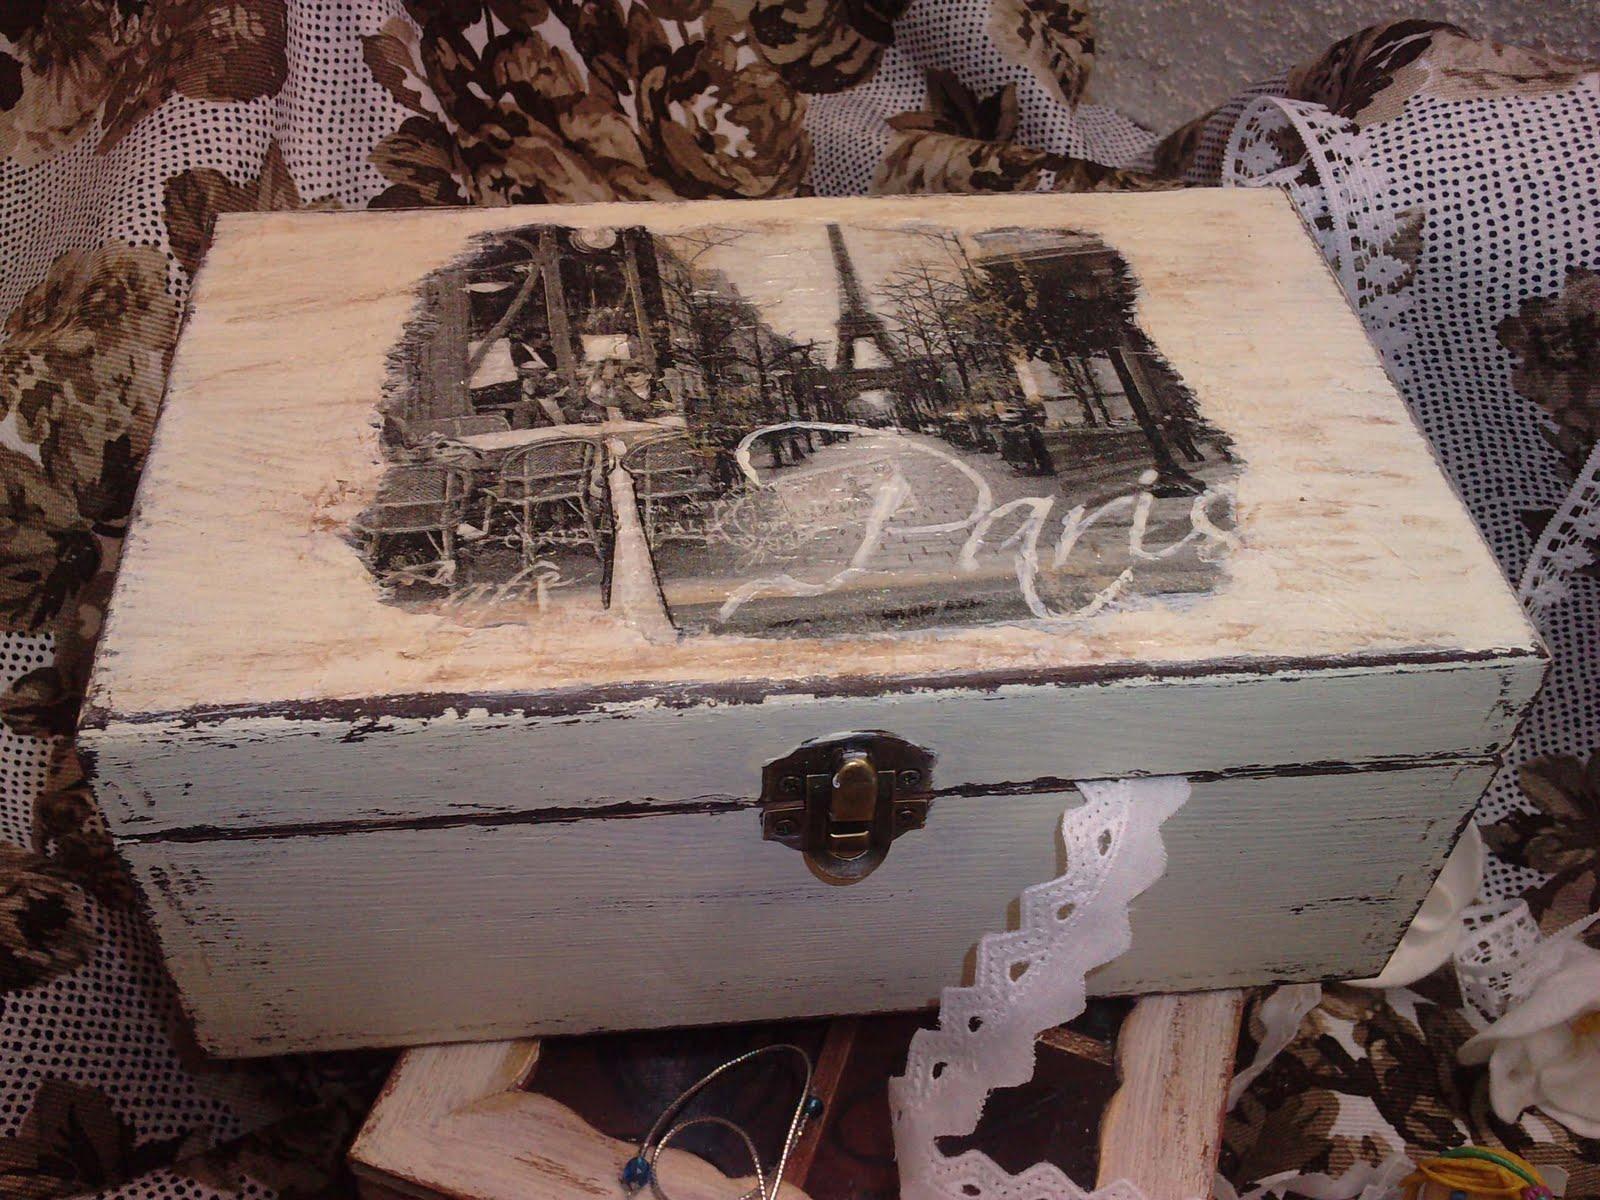 Artesania mydina cajas de madera decoradas en diferentes - Cajas de decoracion ...